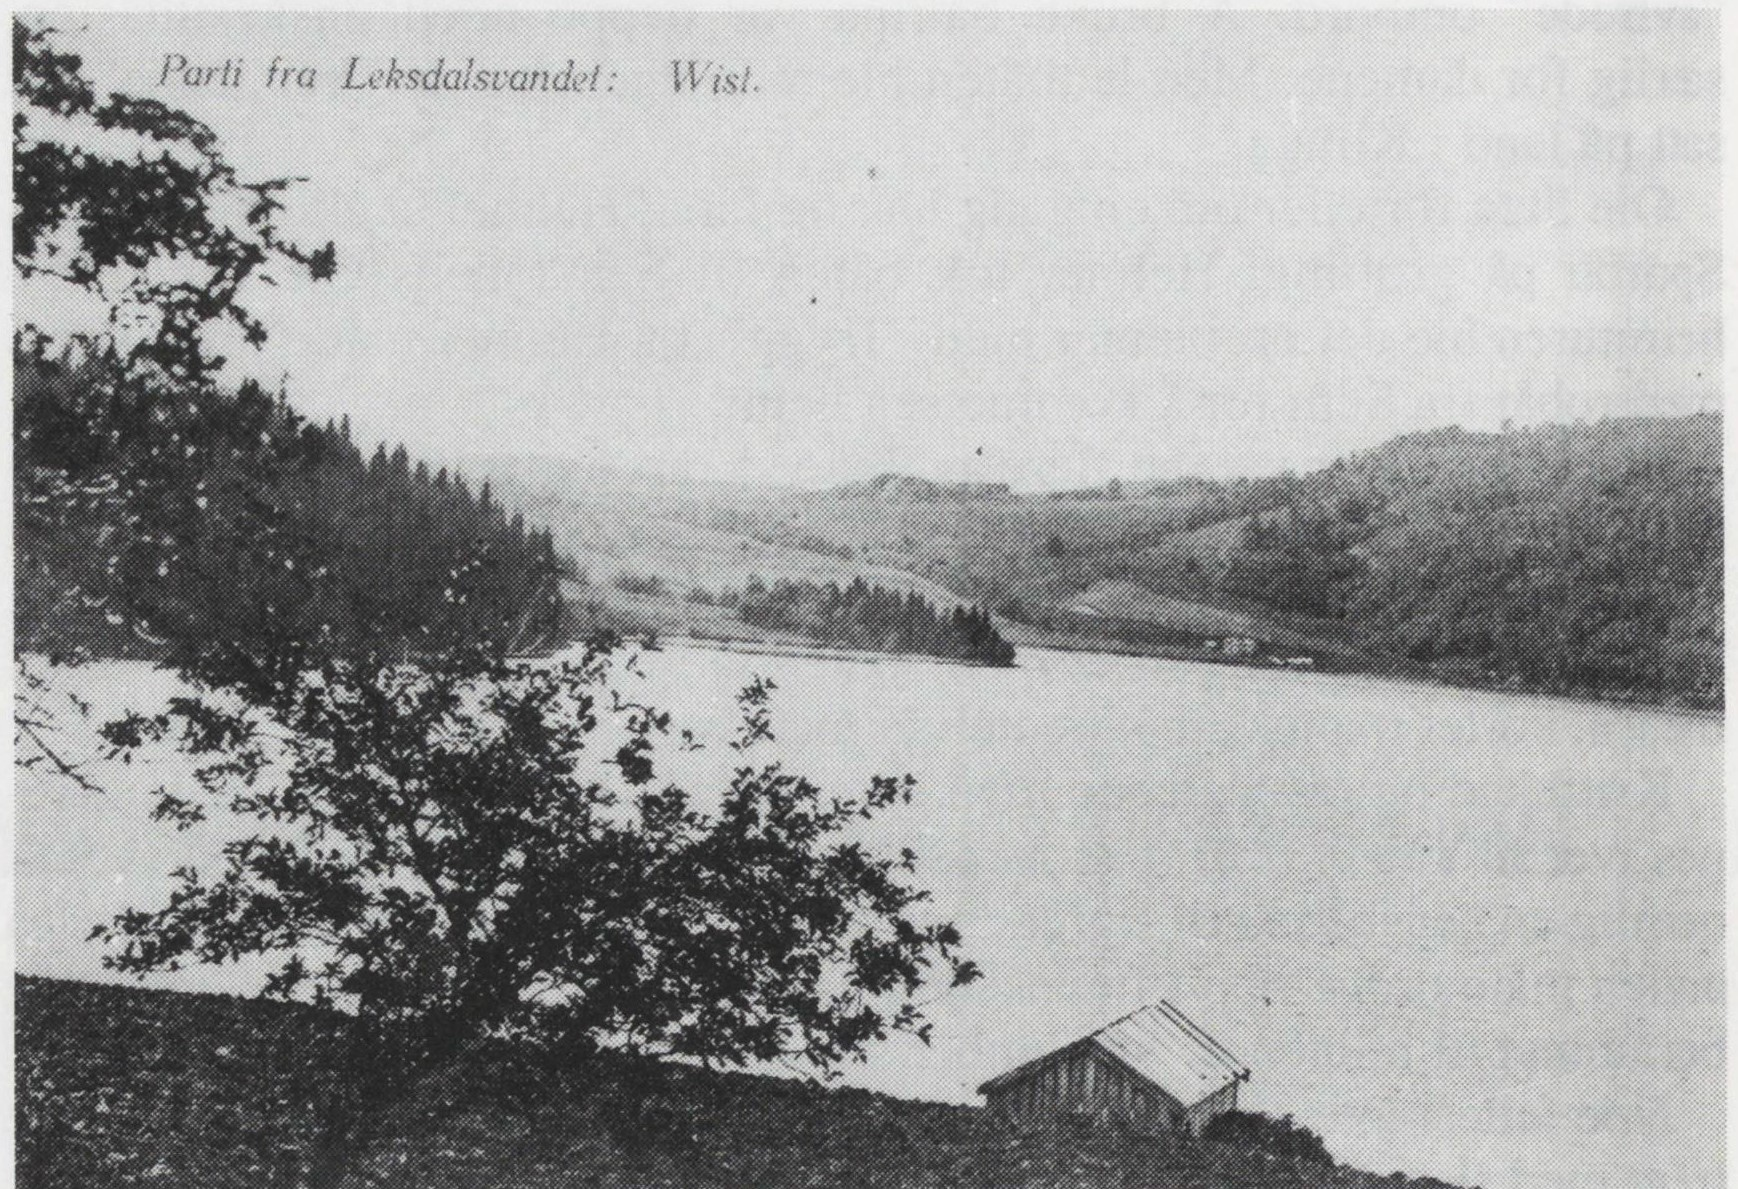 Parti fra Leksdalsvatnet, Wist Fra Verdal historielags skrifter 18 - 1991